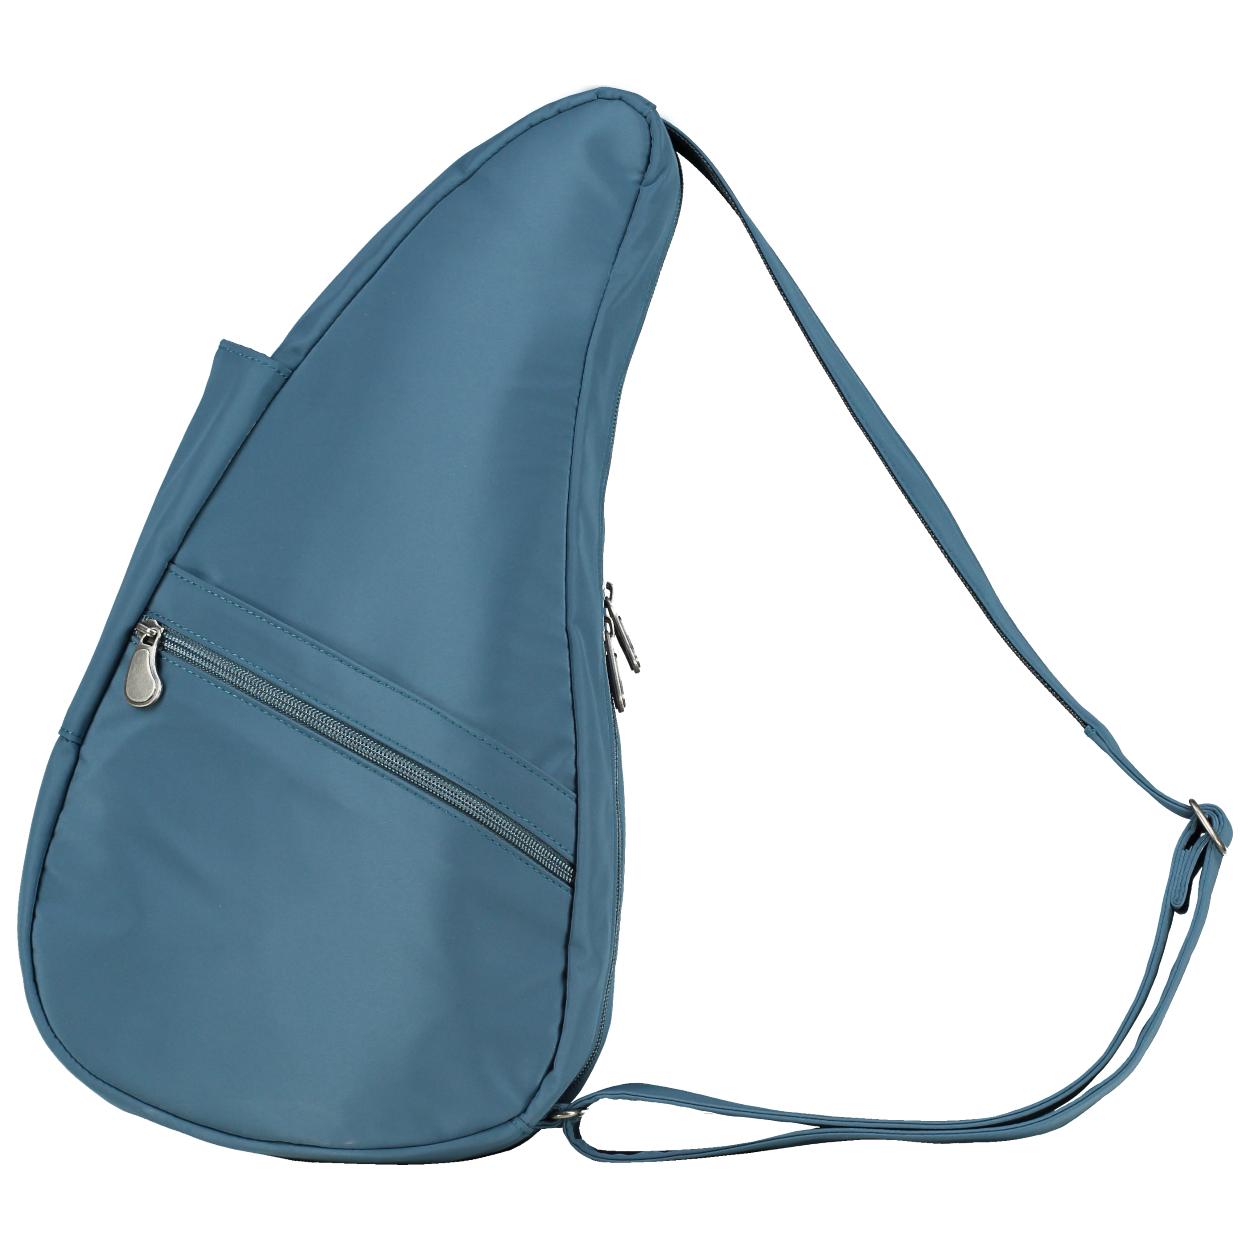 Healthy Back Bag 7303 Microfibre Nile Blue S